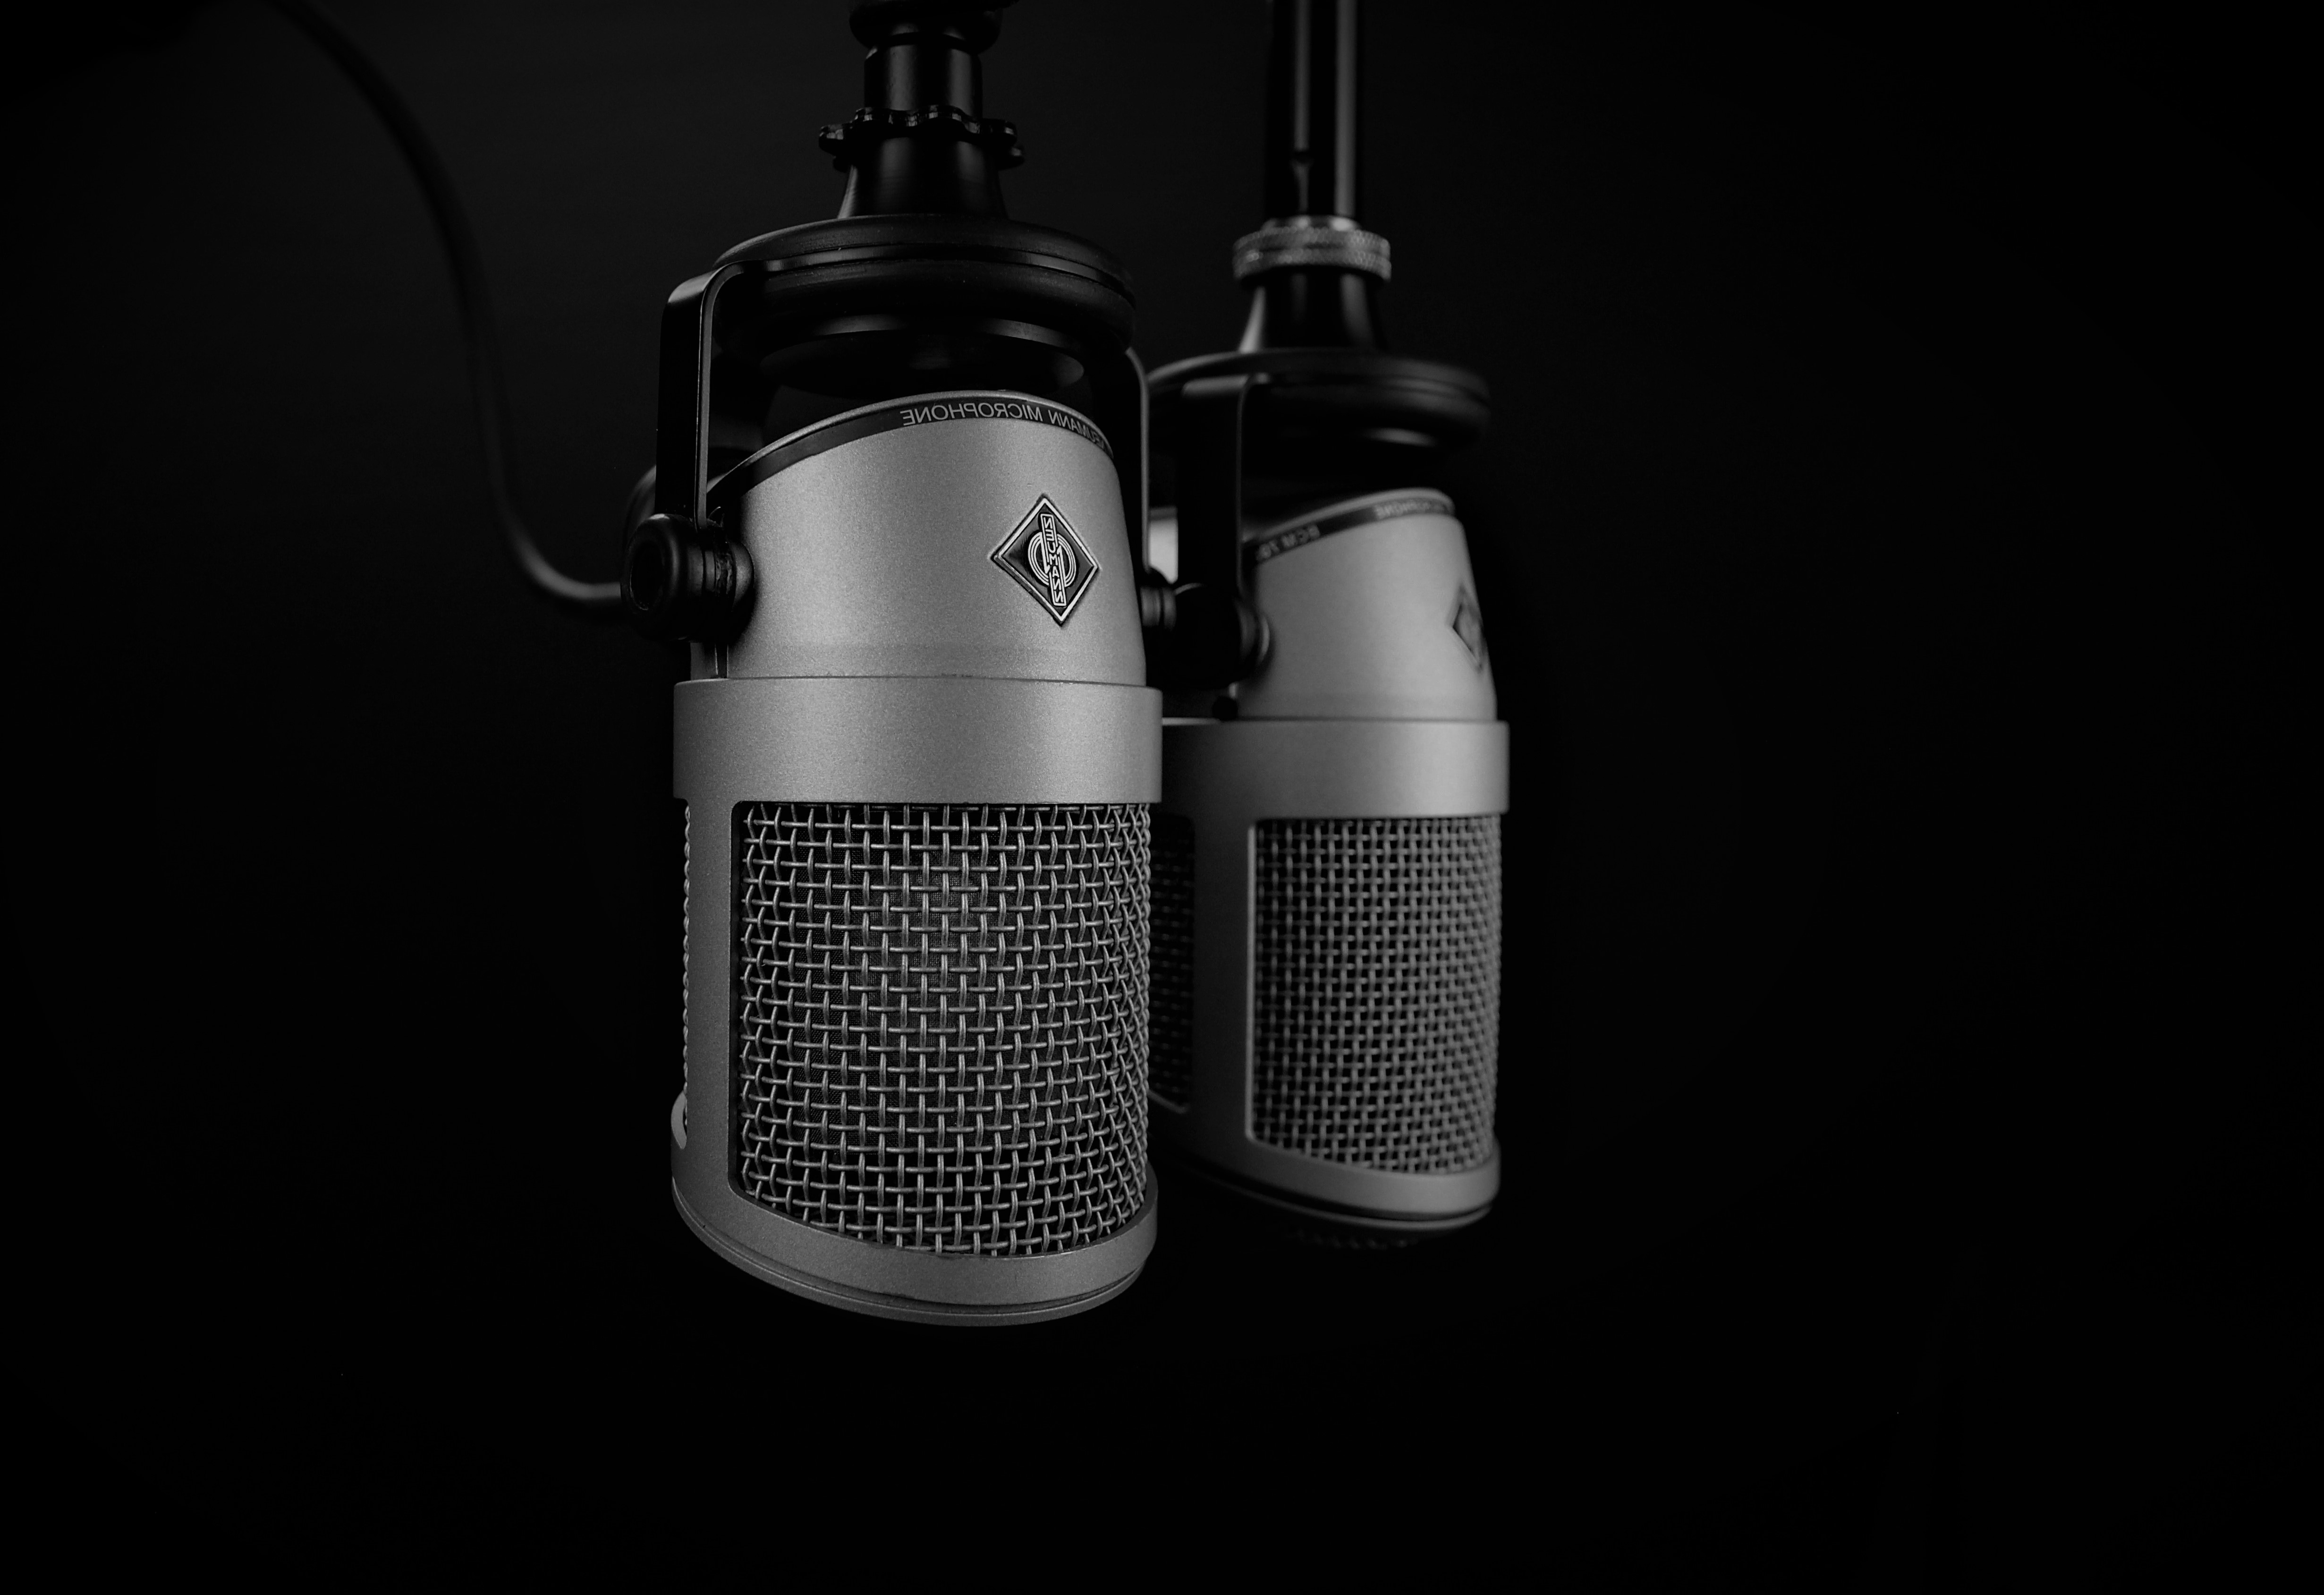 SaaS business podcast repurpose